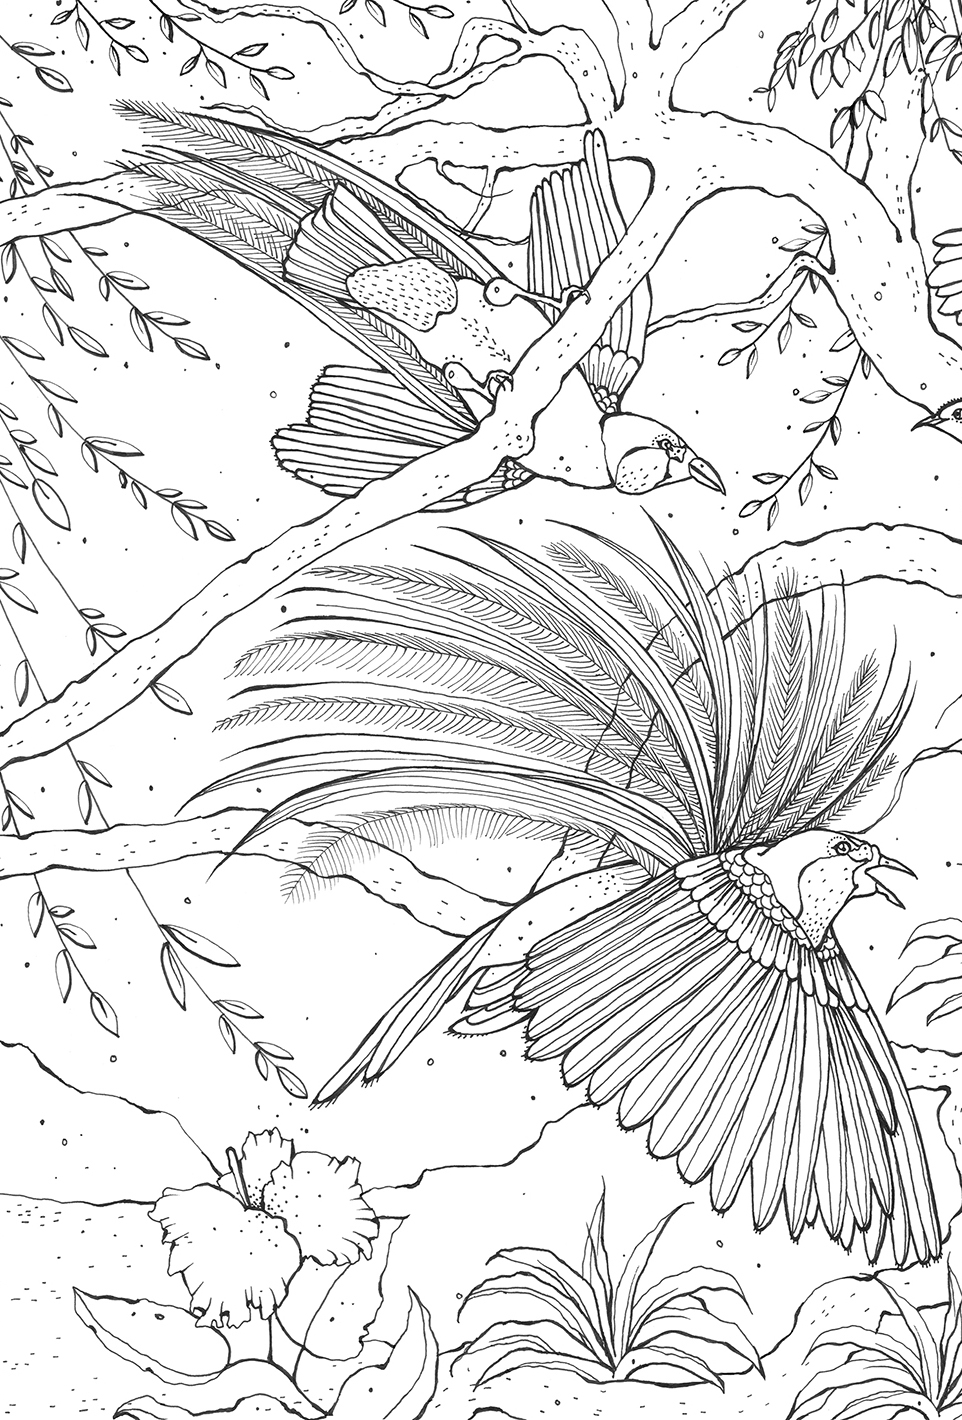 Kerry Lemon: 'Birds of Paradise' colouring book